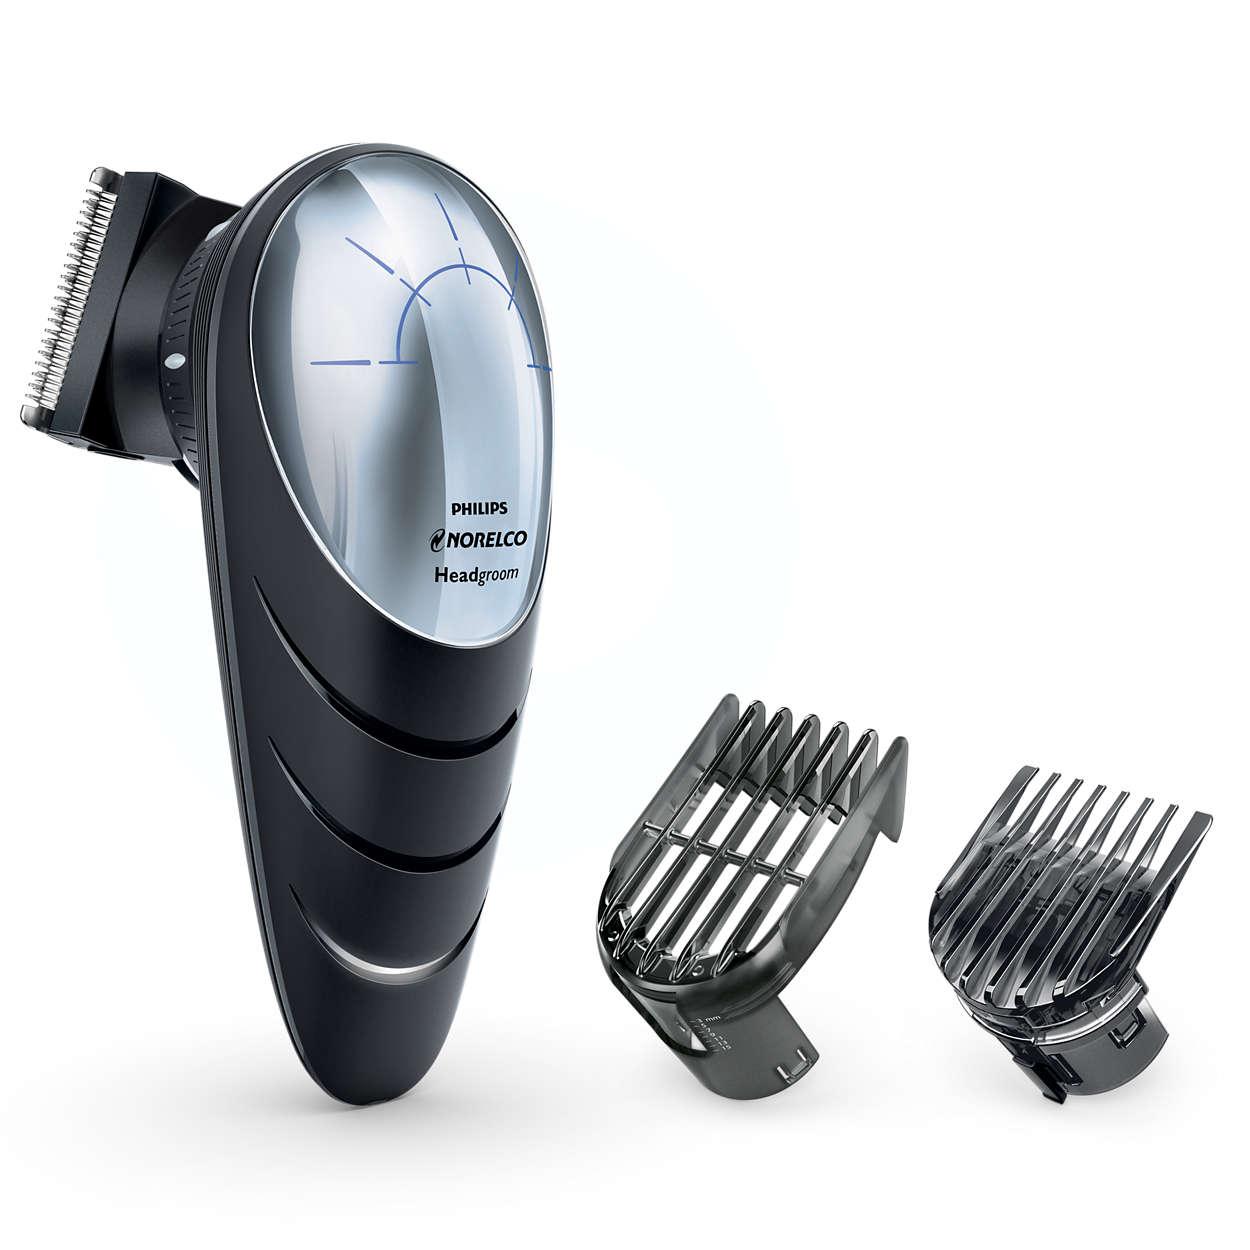 diy cordless hair clipper qc5570 40 norelco. Black Bedroom Furniture Sets. Home Design Ideas